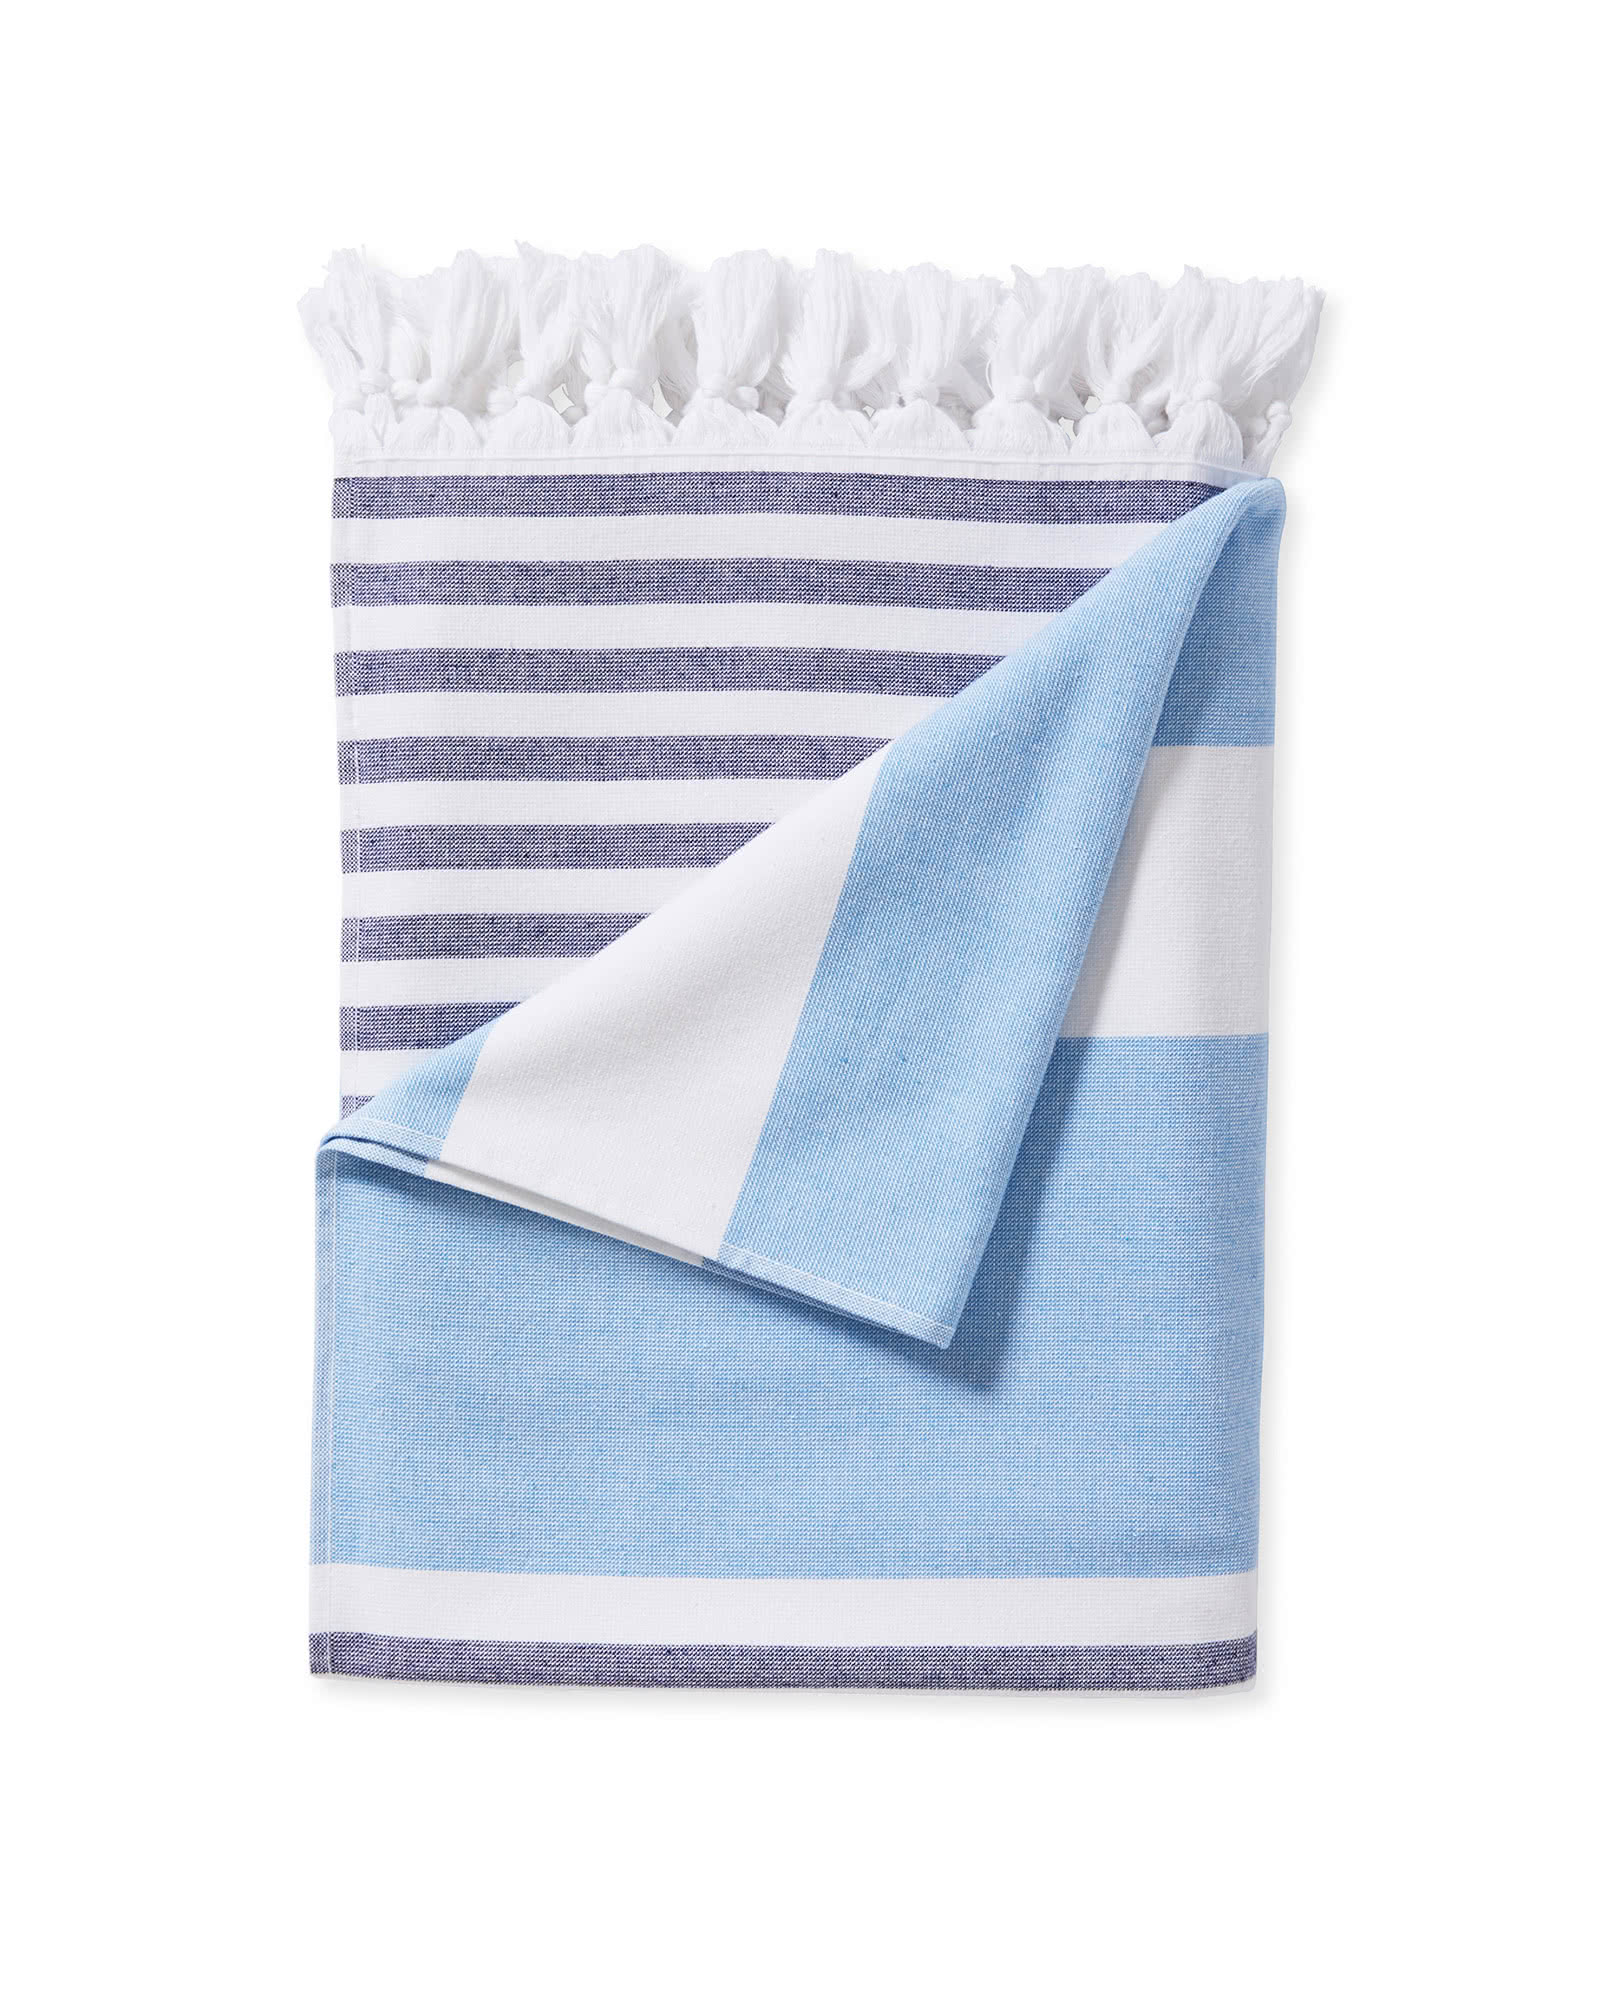 Beach_Towel_Capri_Blue_Harbor_Fold_MV_1256_Crop_SH.jpg